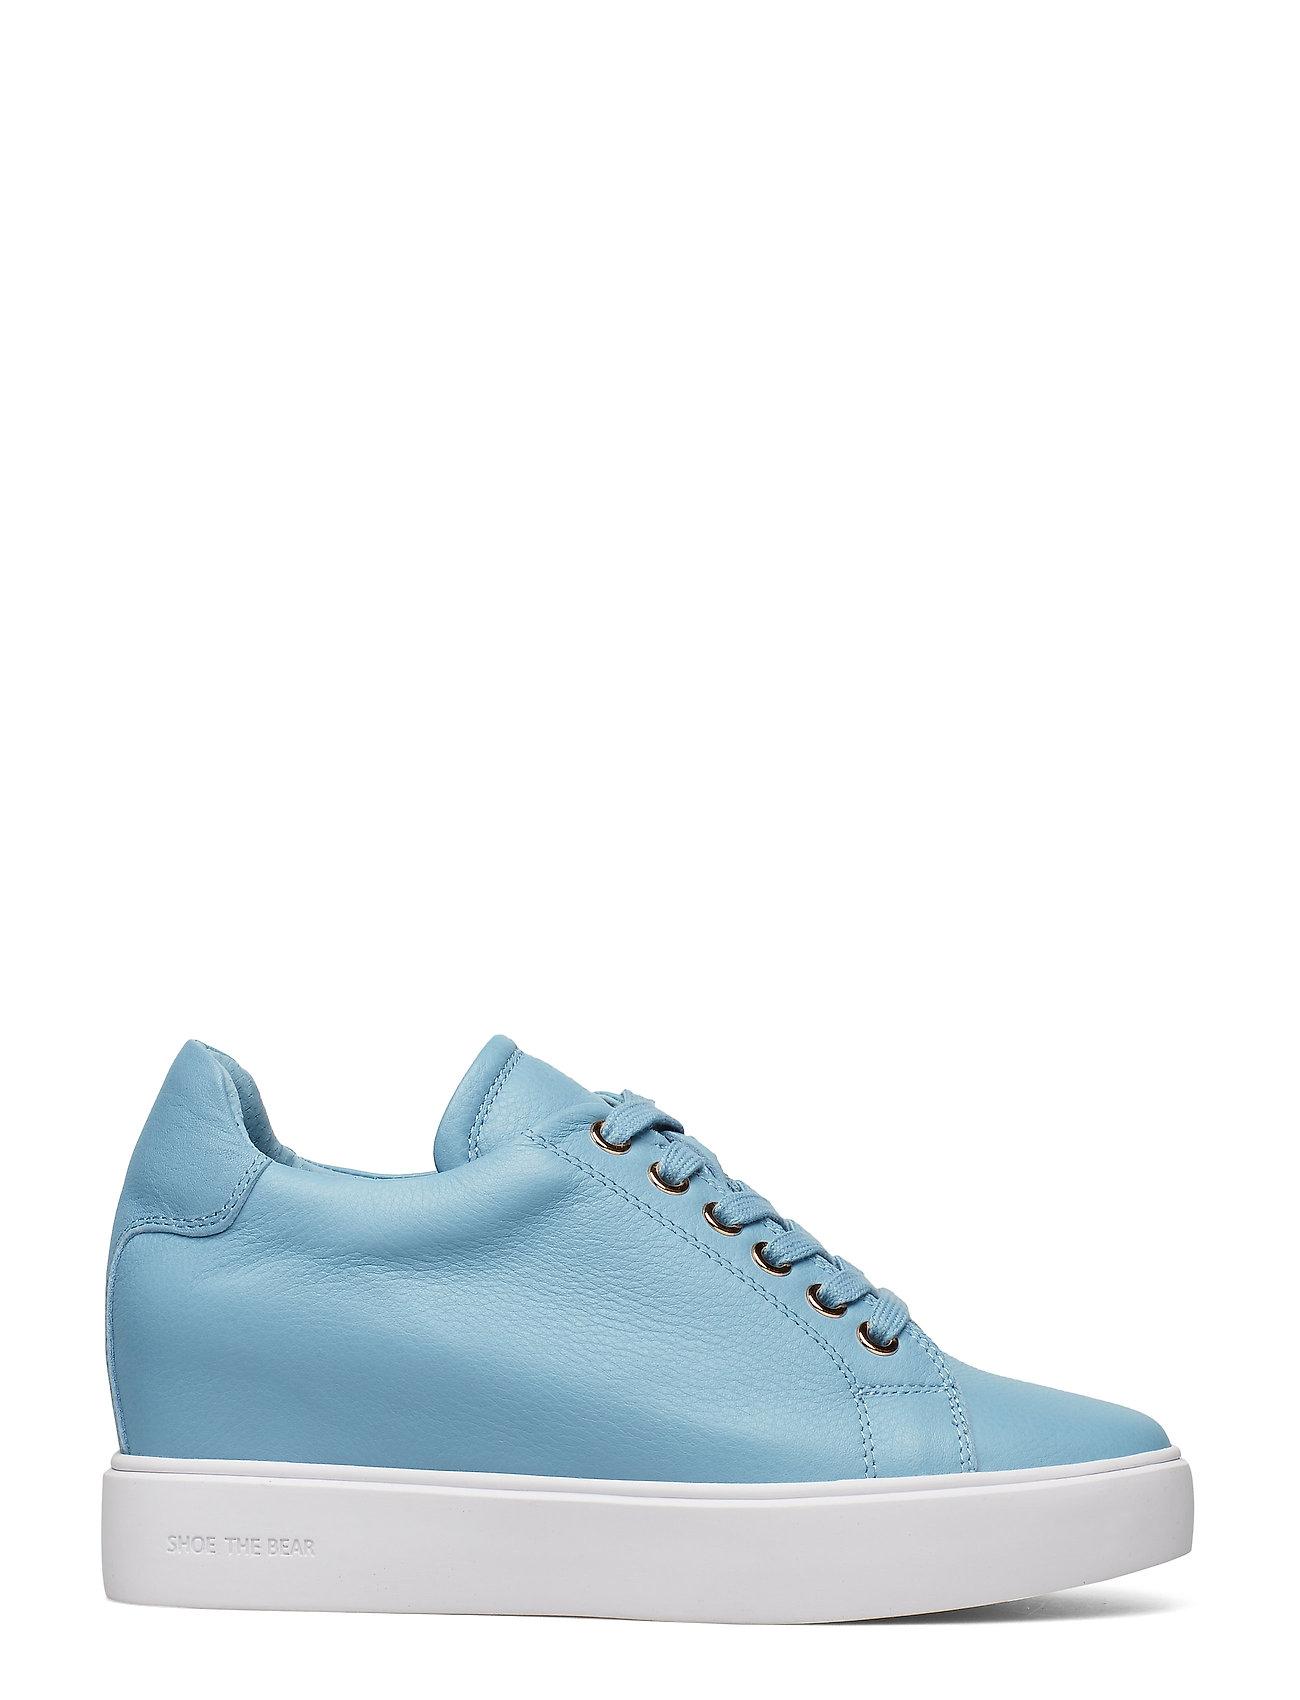 Ava L Sneakers Plateau Blå Shoe The Bear